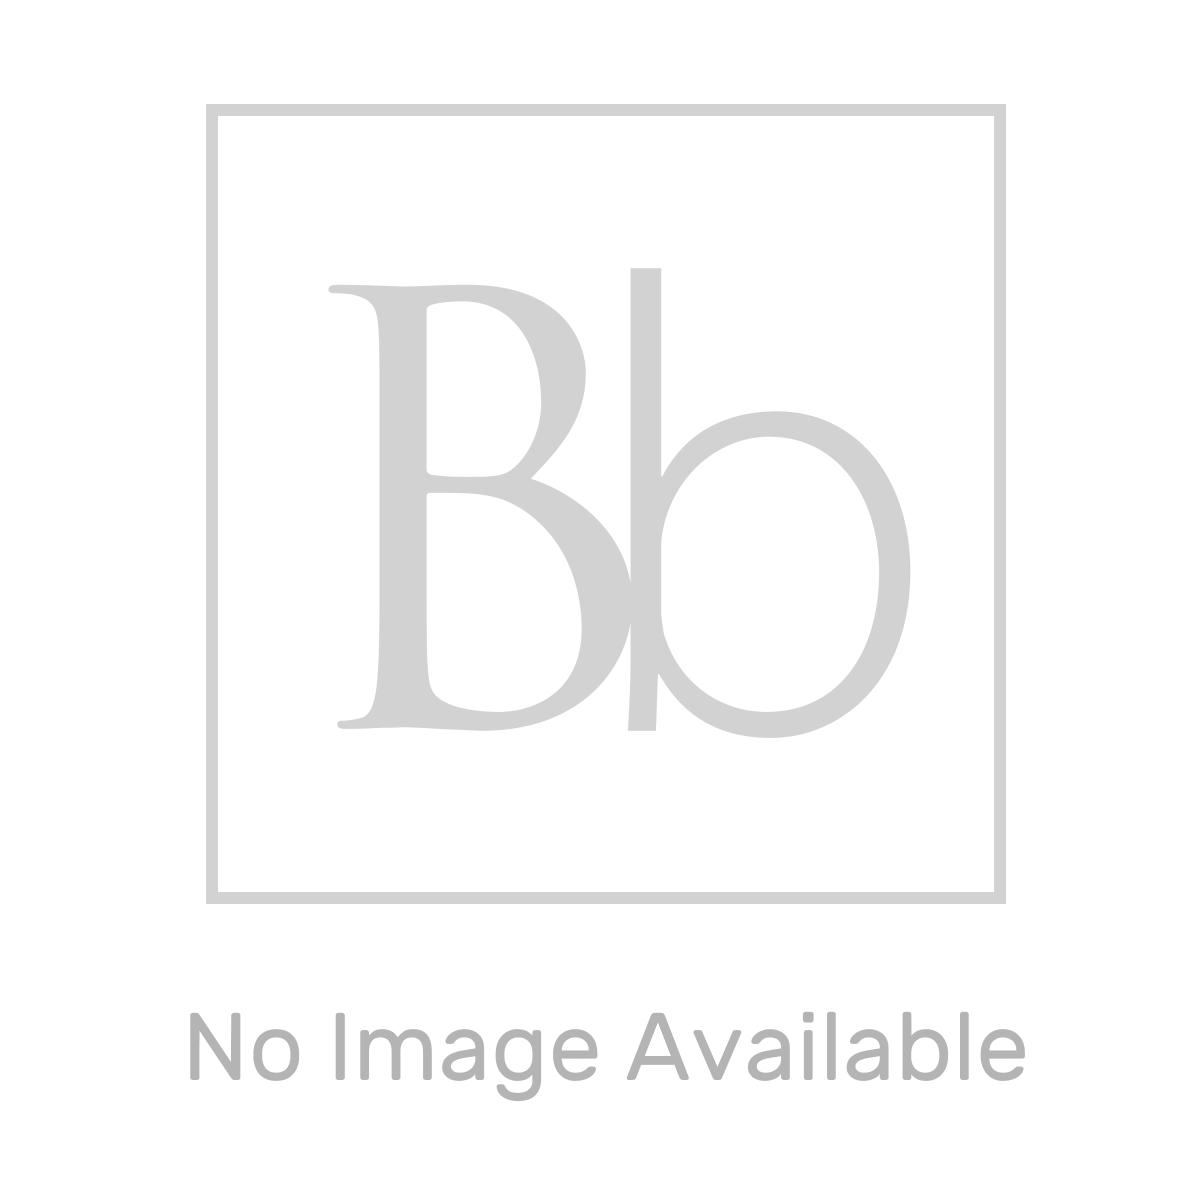 Bathrooms To Love RefleXion Flex 1 Door Offset Quadrant Shower Enclosure